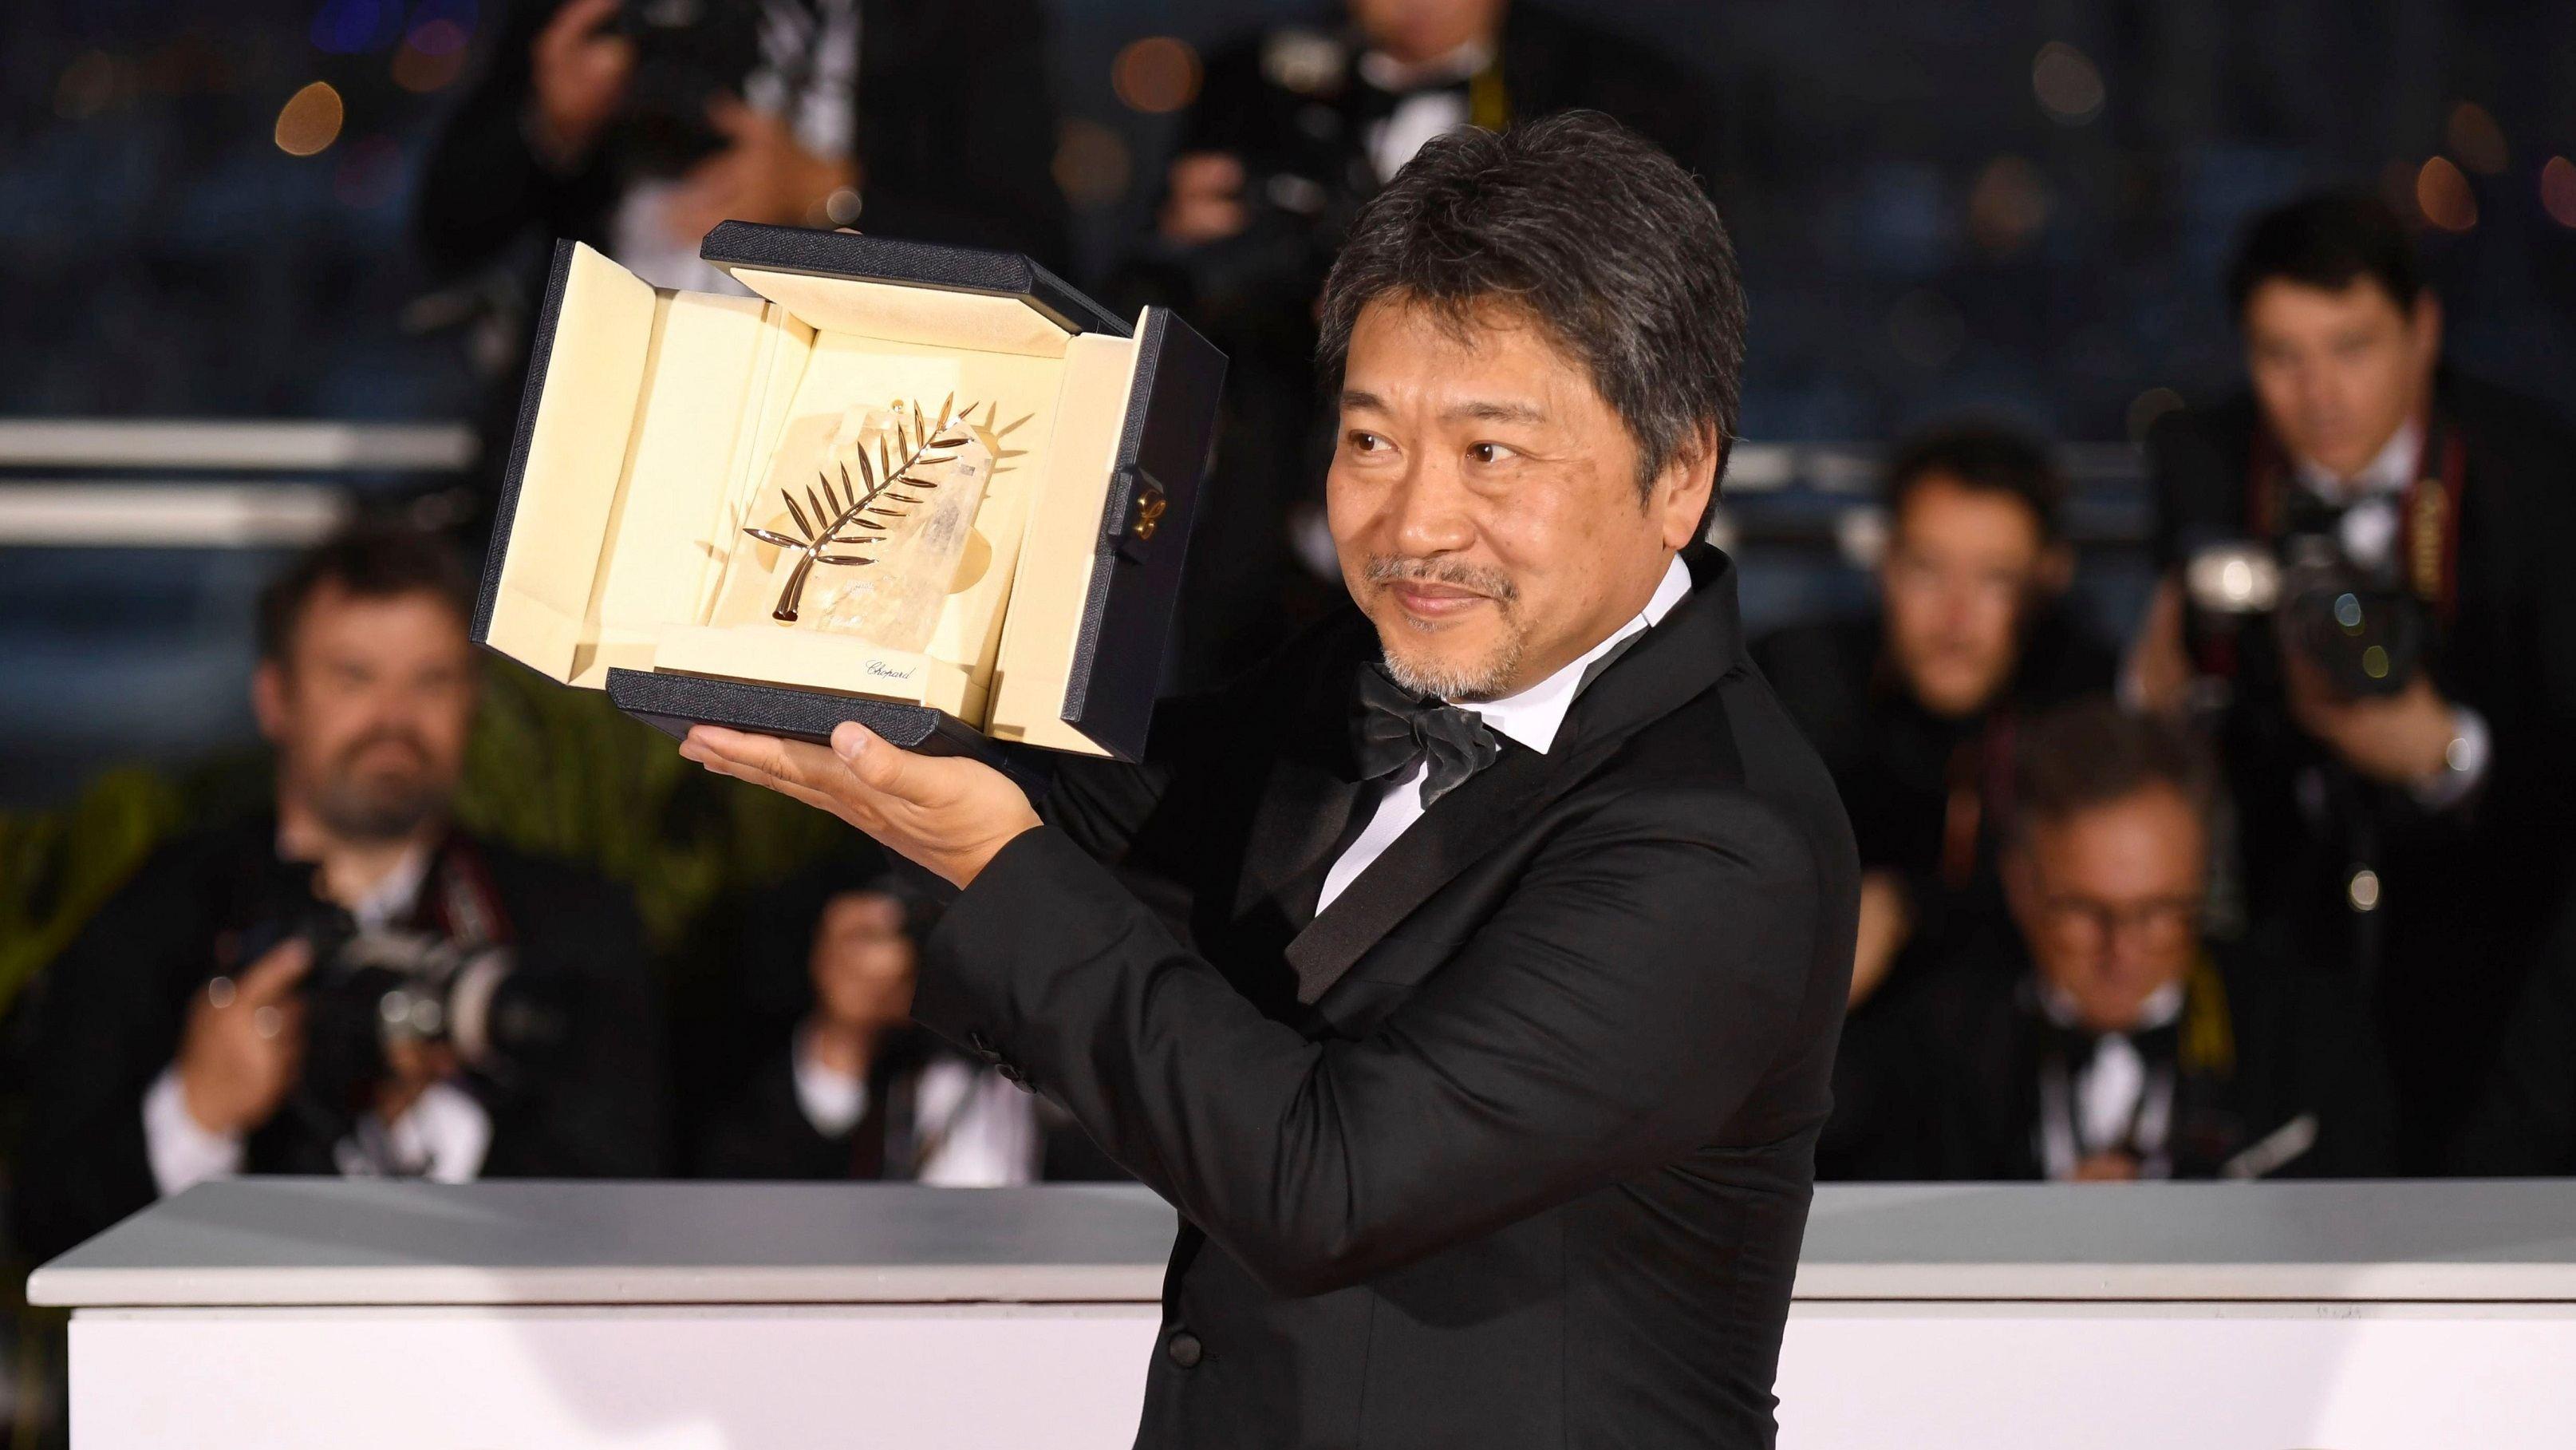 director Hirokazu Kore-eda, the truth movie